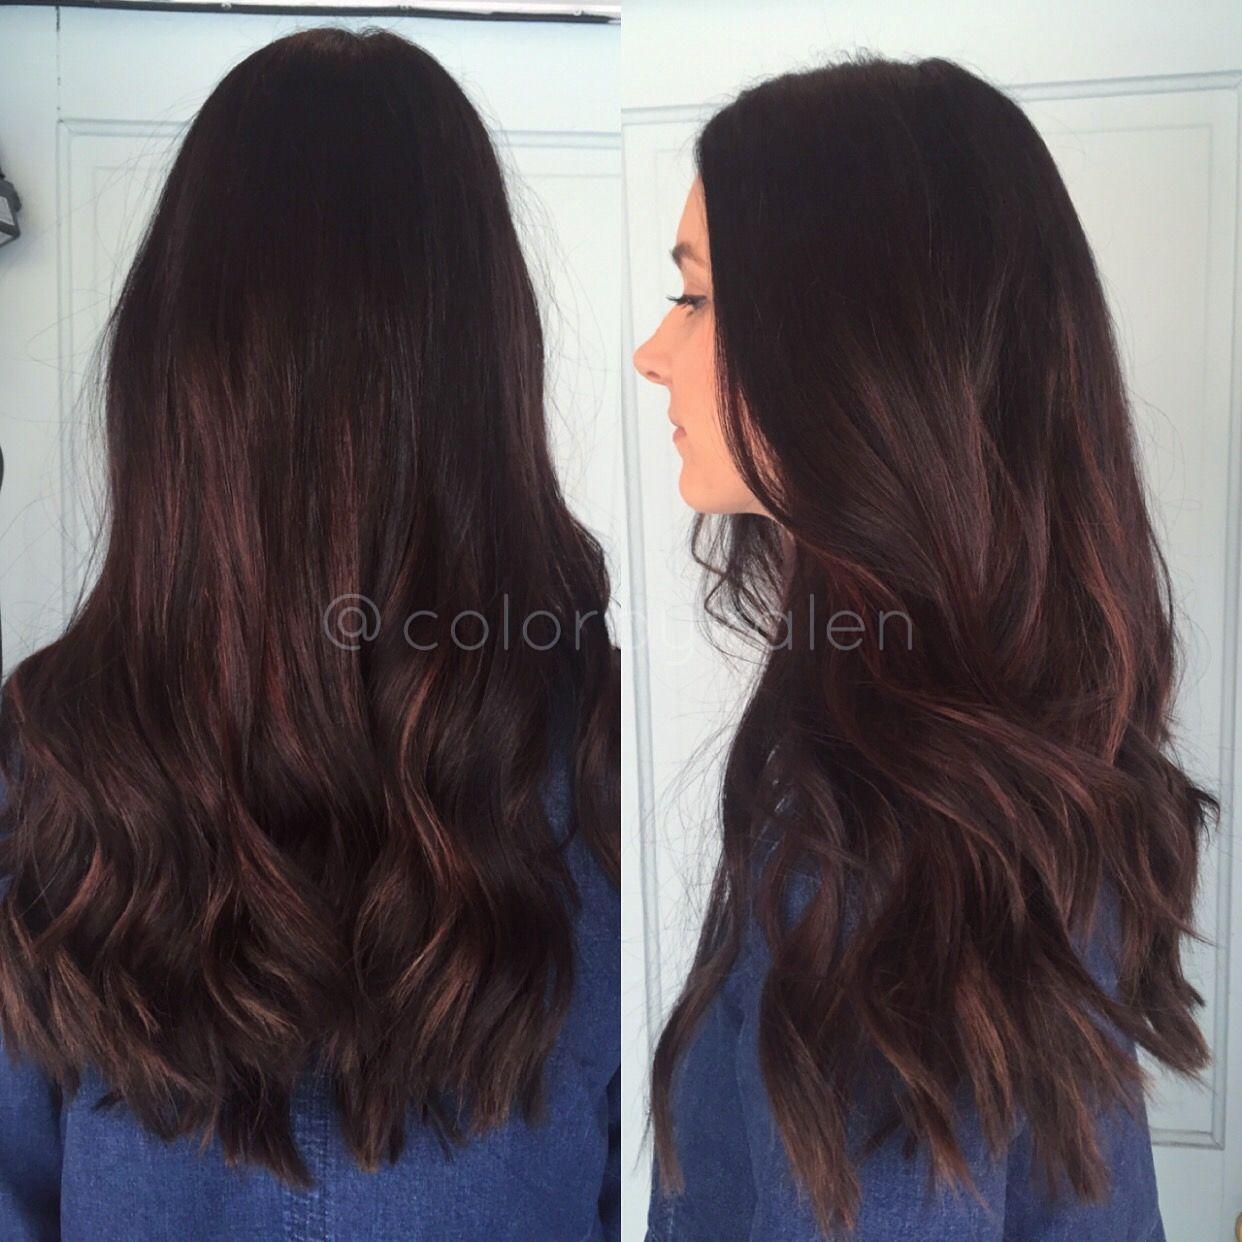 Dark brown hair with burgundy red highlights balayaged in burgundy